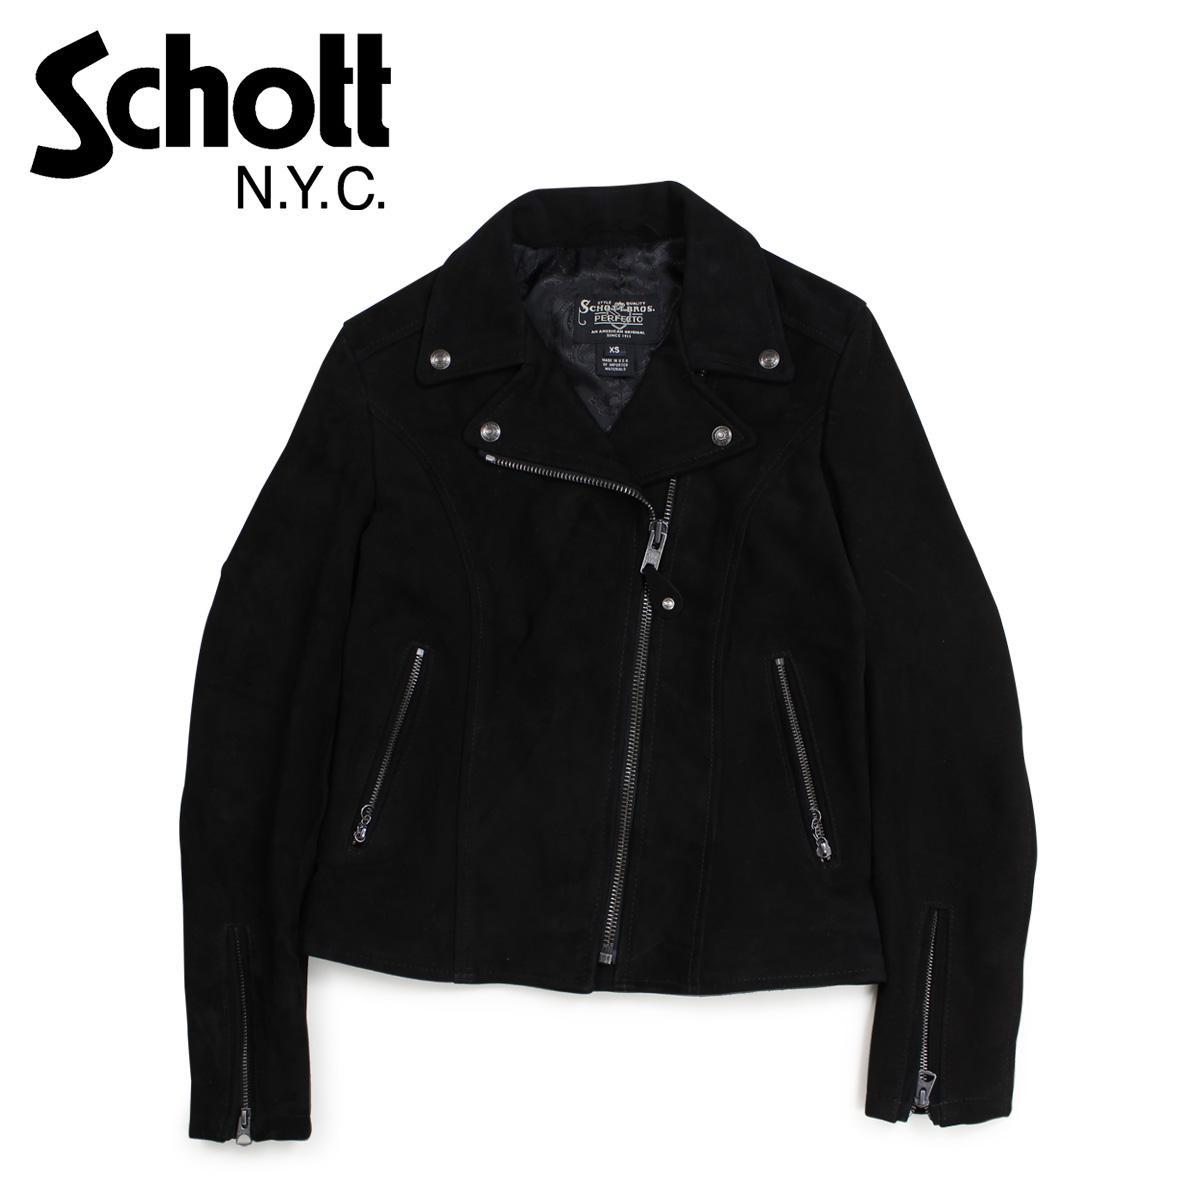 Schott ショット ジャケット ライダースジャケット レディース WOMENS FITTED SUEDE MOTORCYCLE JACKET ブラック 黒 206W